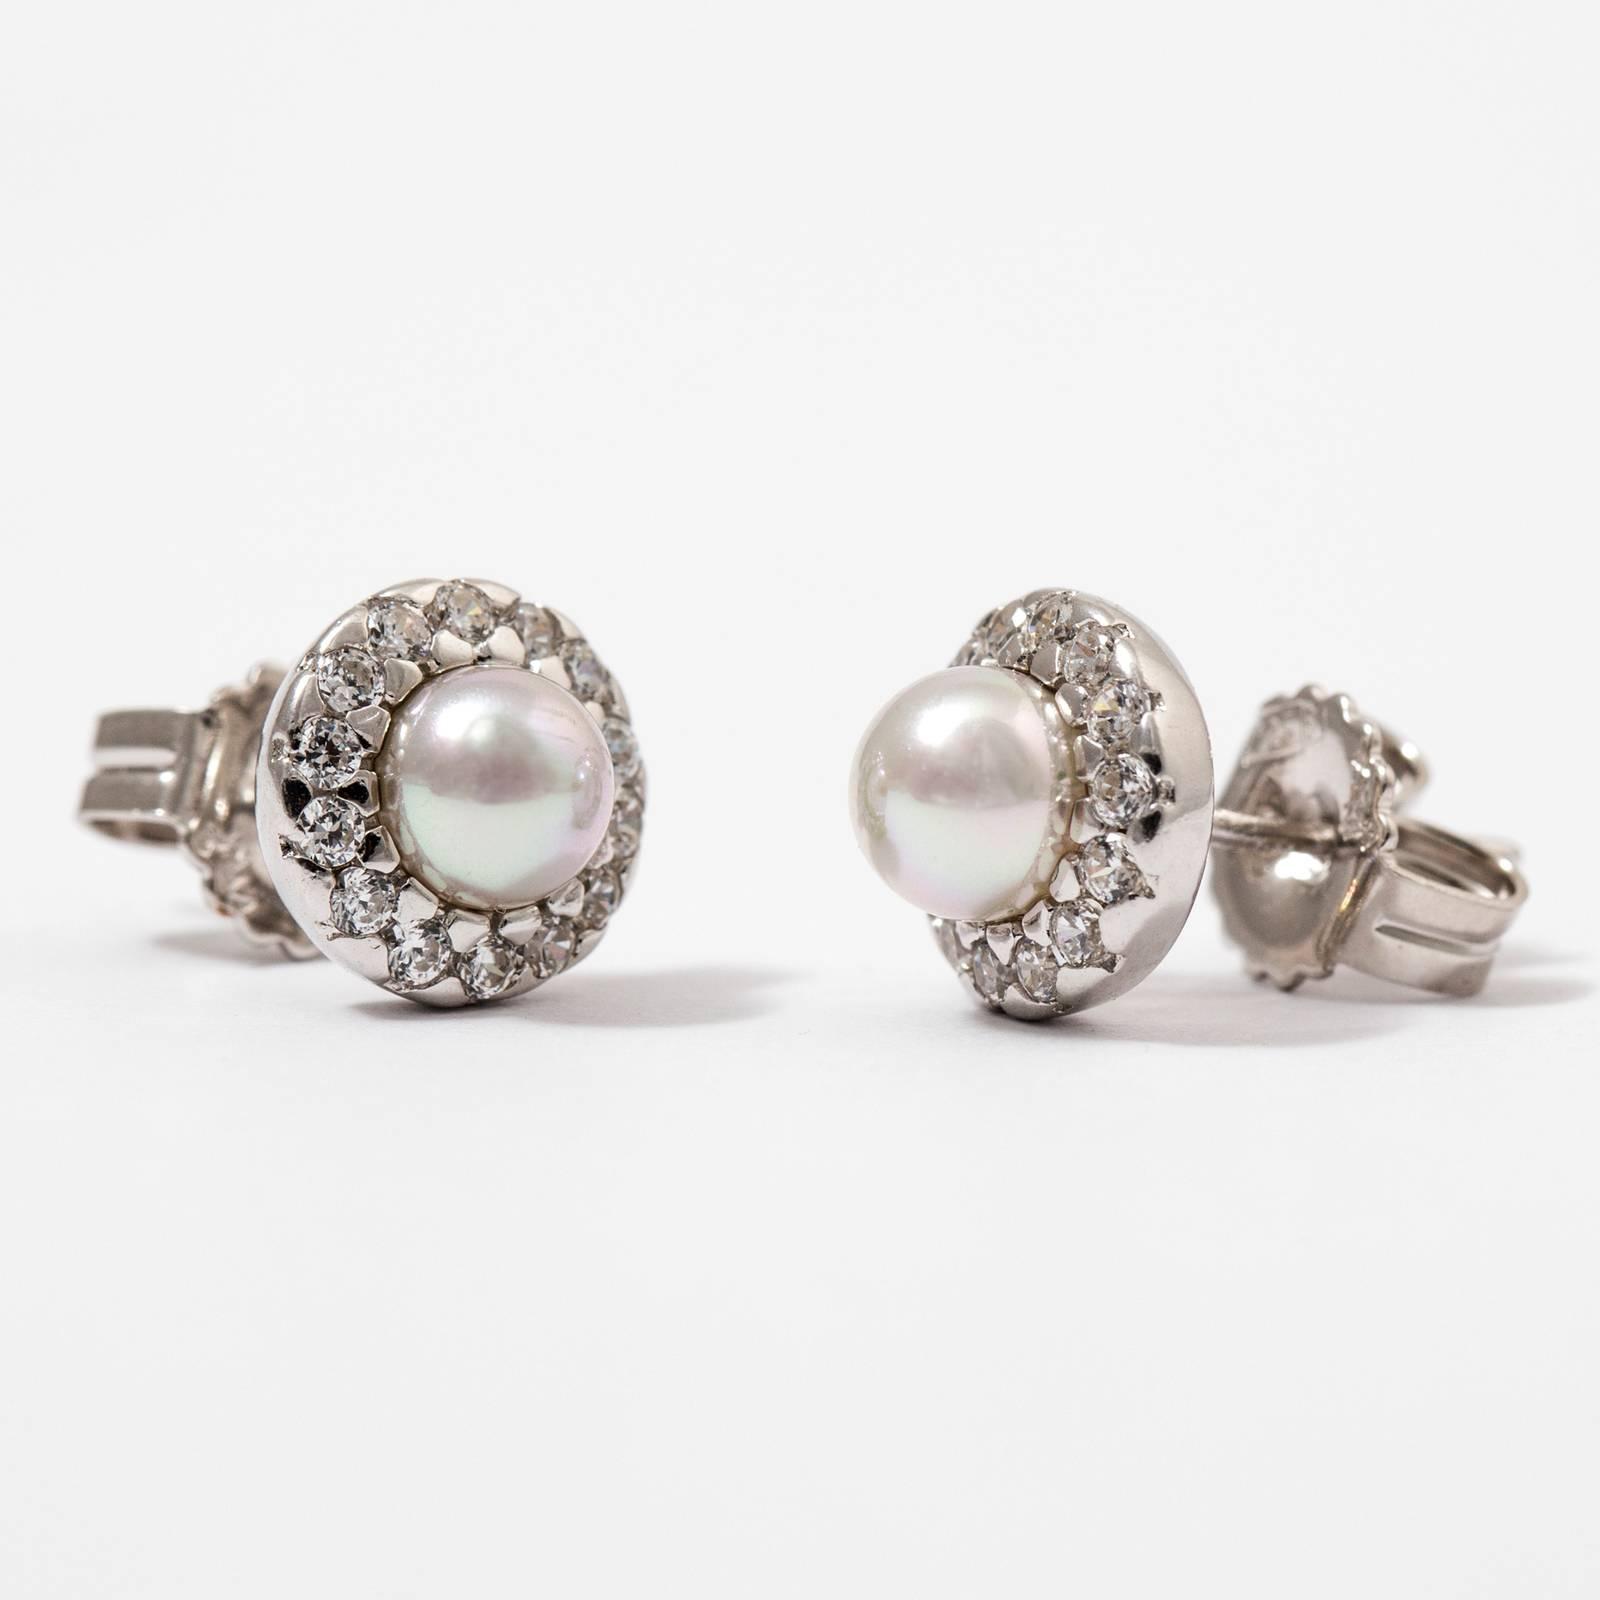 Brincos Fine Silver - 15255.01.2